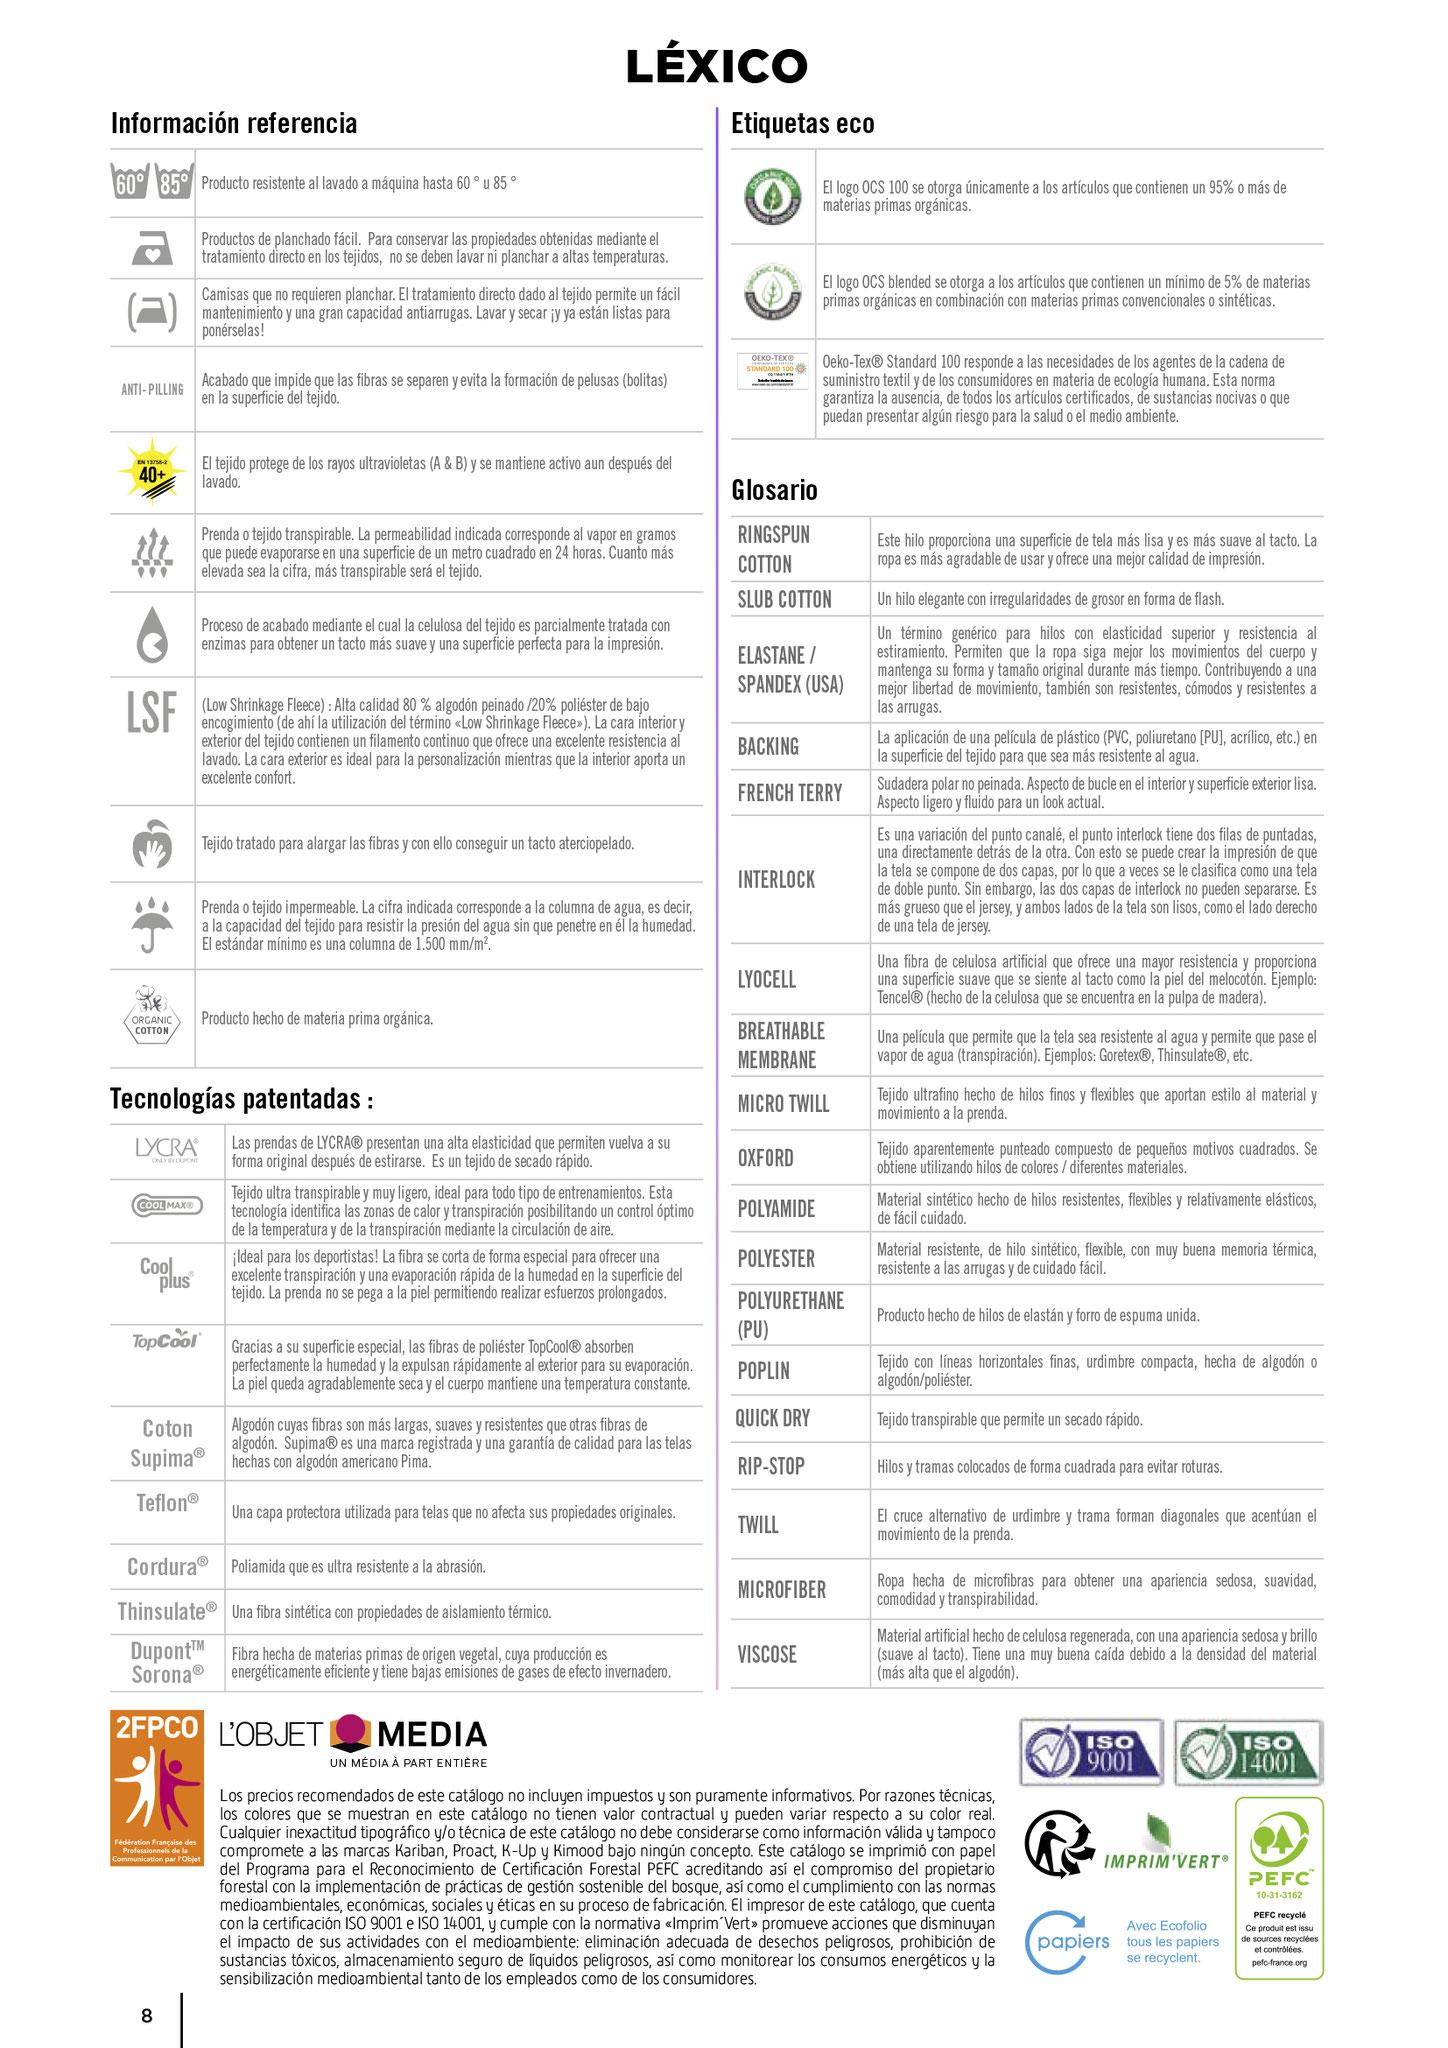 Index textil 2020 , publicidad textil masqueregalos, Marcas Yoko, Dickies, Wrangles, BagBase, Estex, Finden Hales, Larkwood, Rywan, Monnet, Front Row&com